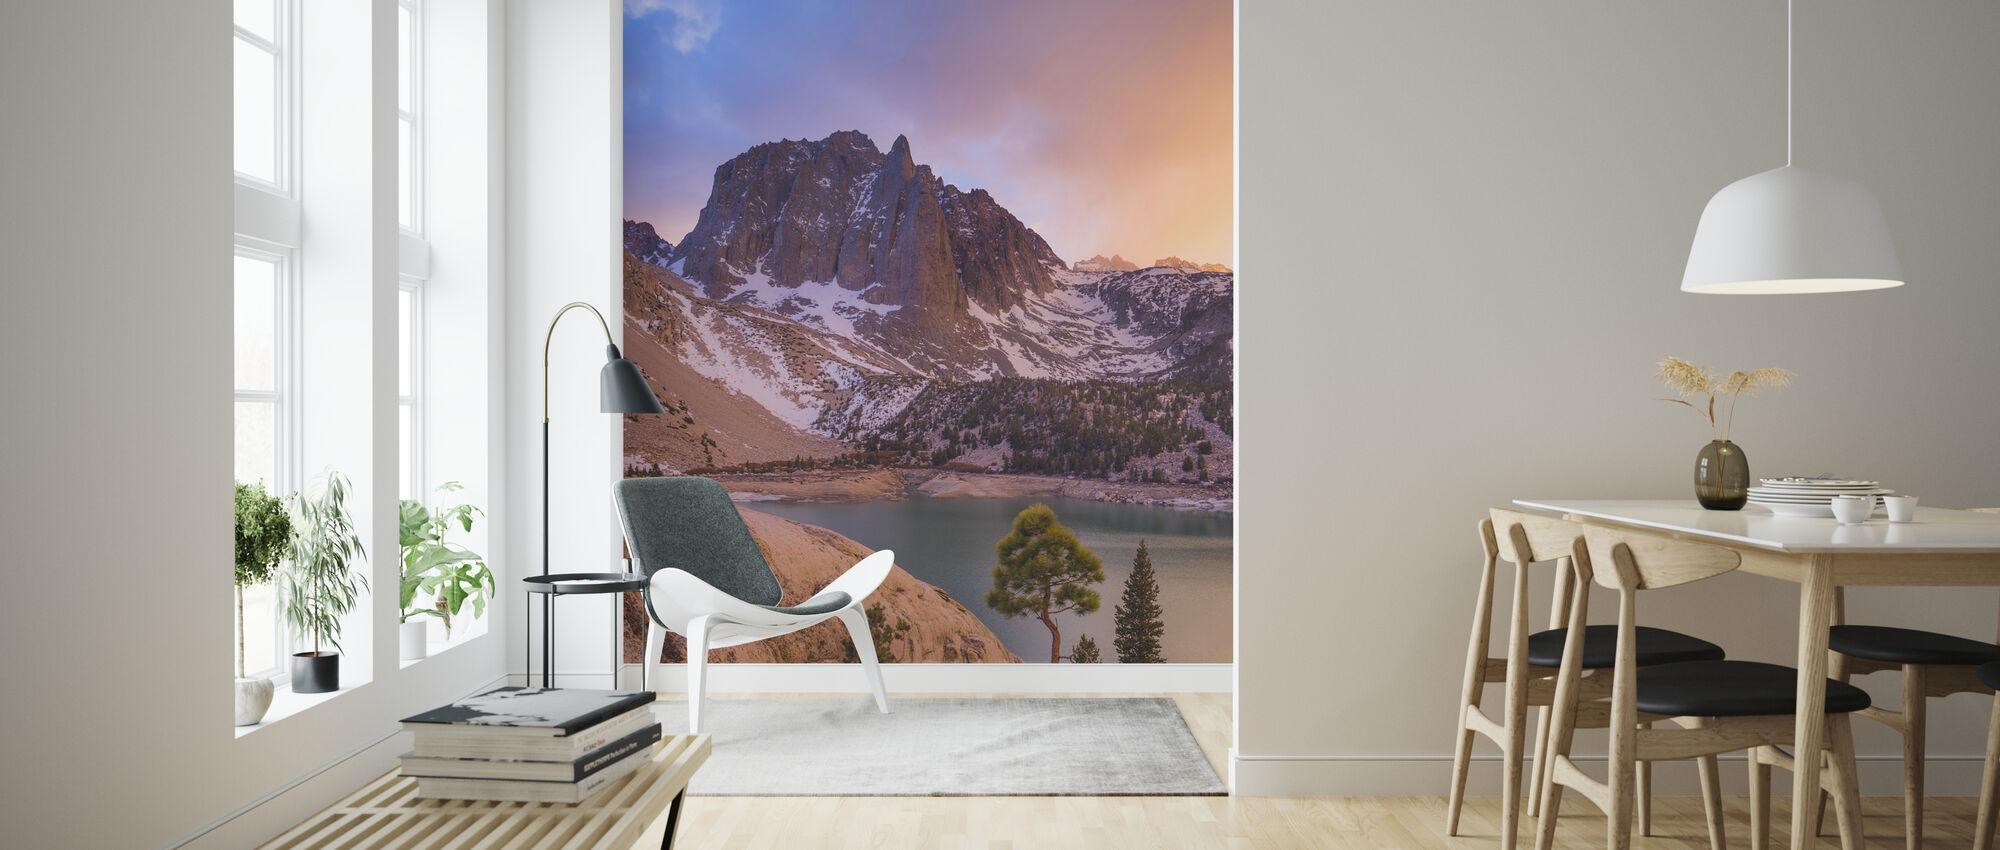 Temple Crag Above Lake, Sierra Nevada - Wallpaper - Living Room